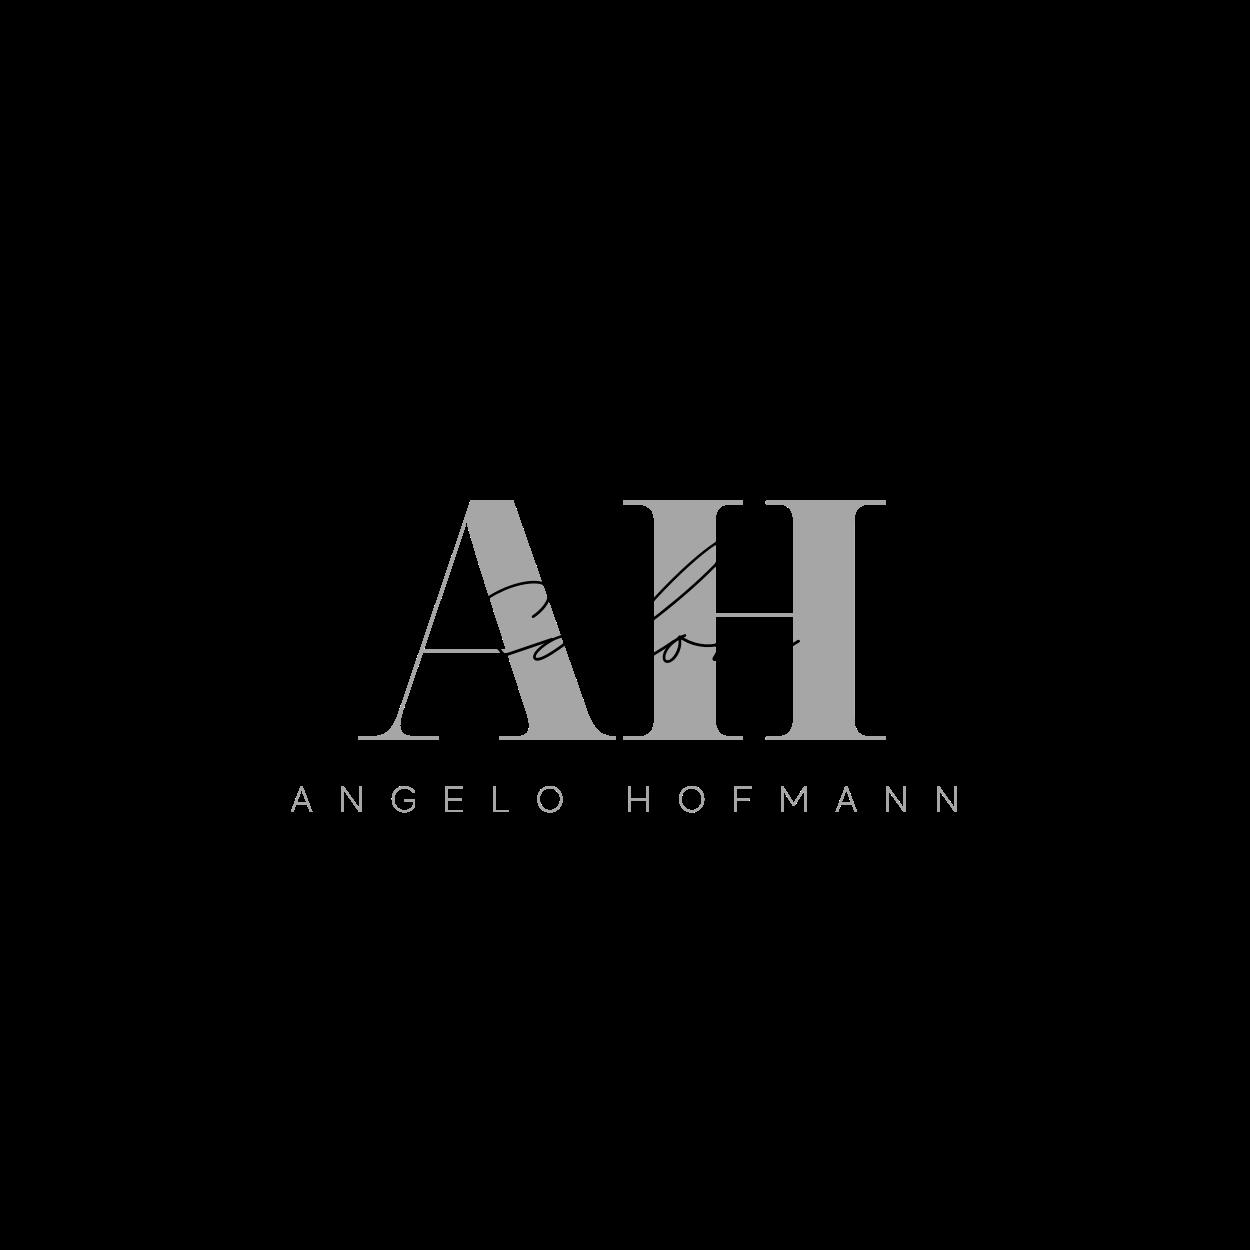 Angelo Hofmann